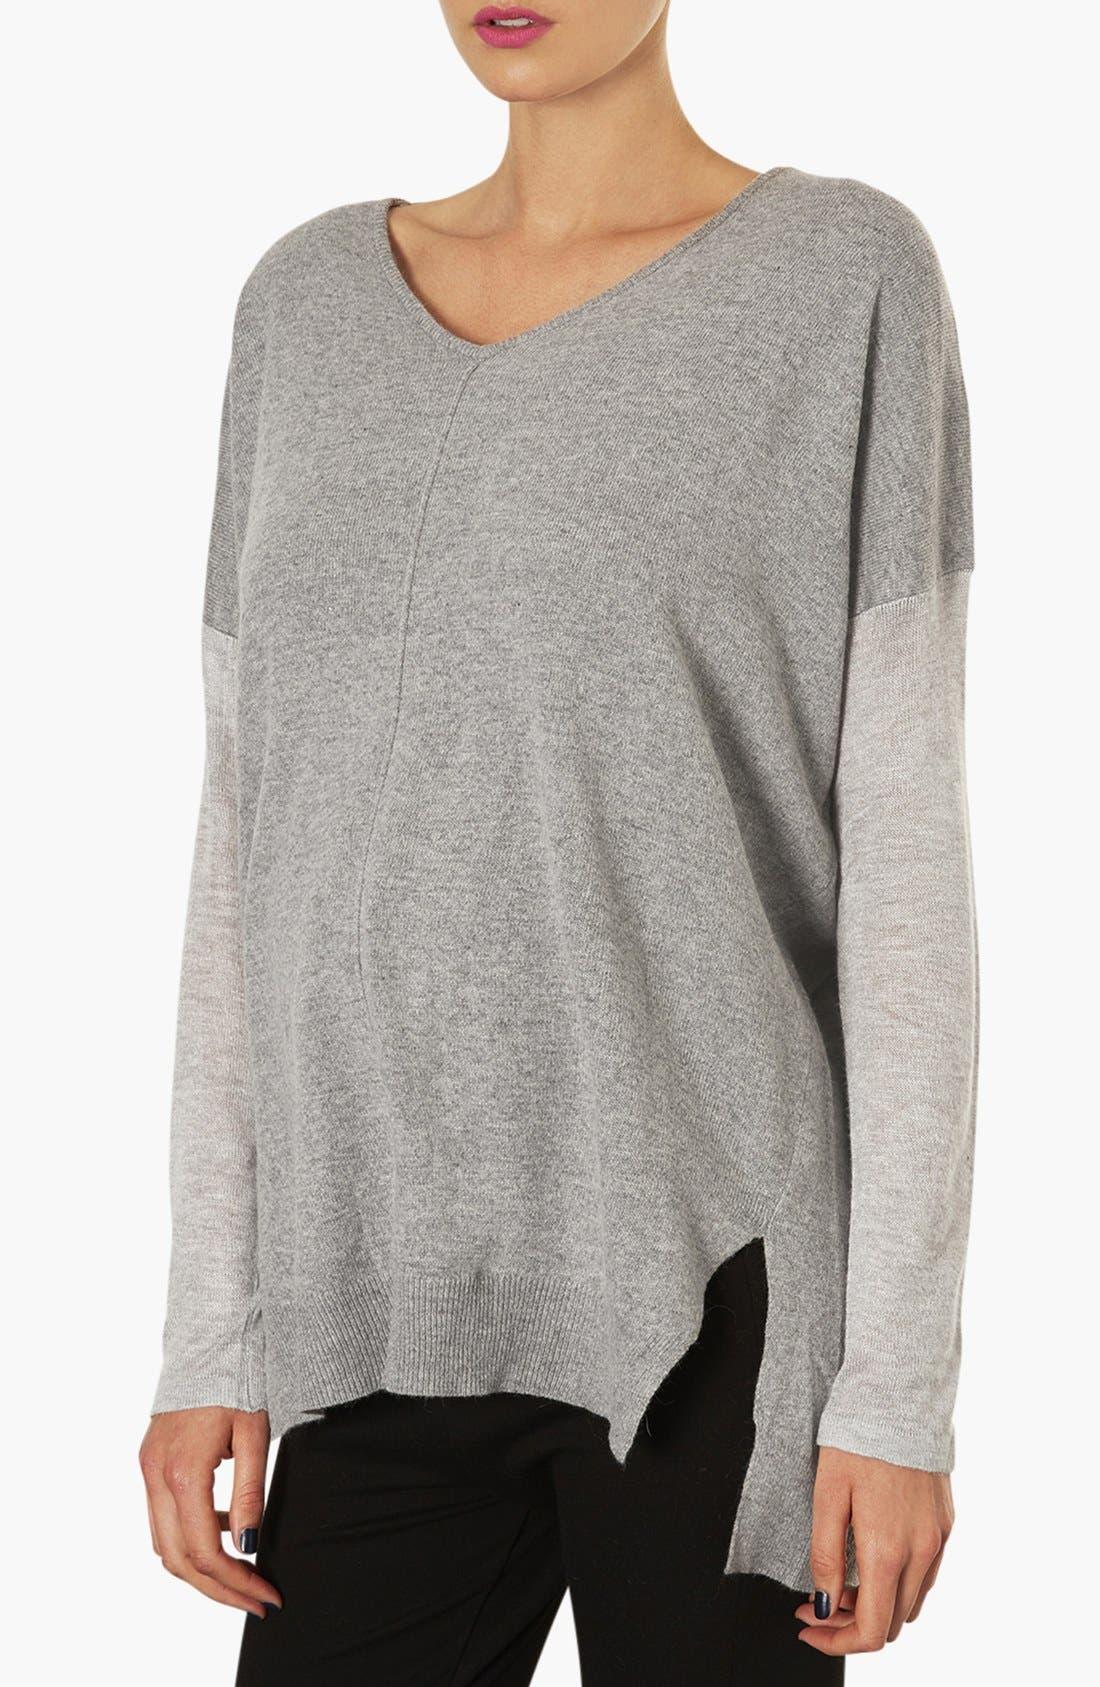 Alternate Image 1 Selected - Topshop V-Neck Maternity Sweater